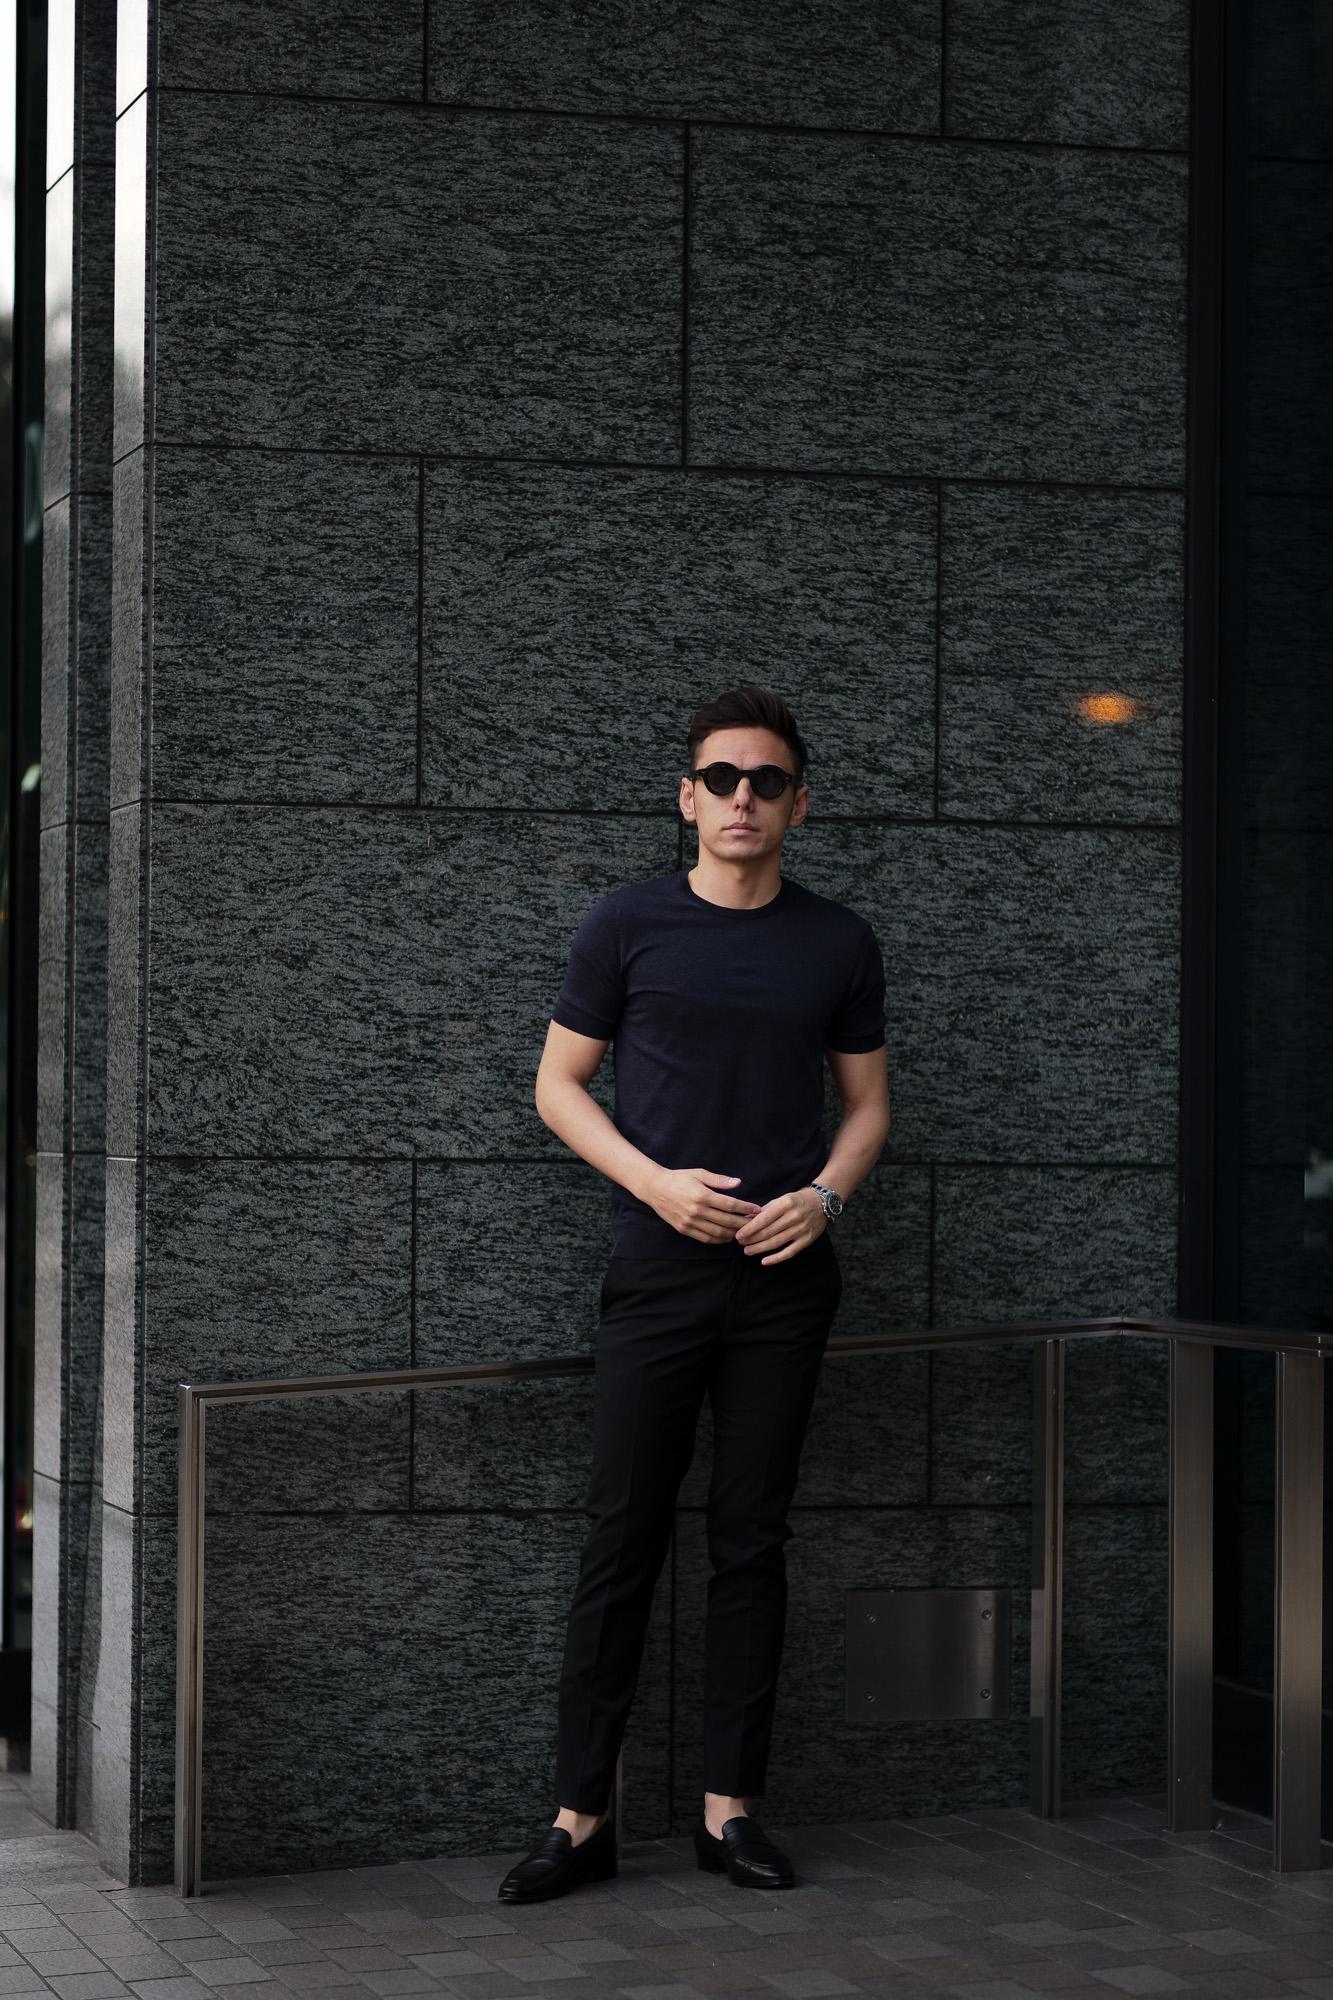 Gran Sasso (グランサッソ) Silk Knit T-shirt (シルクニット Tシャツ) SETA (シルク 100%) ショートスリーブ シルク ニット Tシャツ NAVY (ネイビー・597) made in italy (イタリア製) 2020 春夏新作  gransasso 愛知 名古屋 altoediritto アルトエデリット